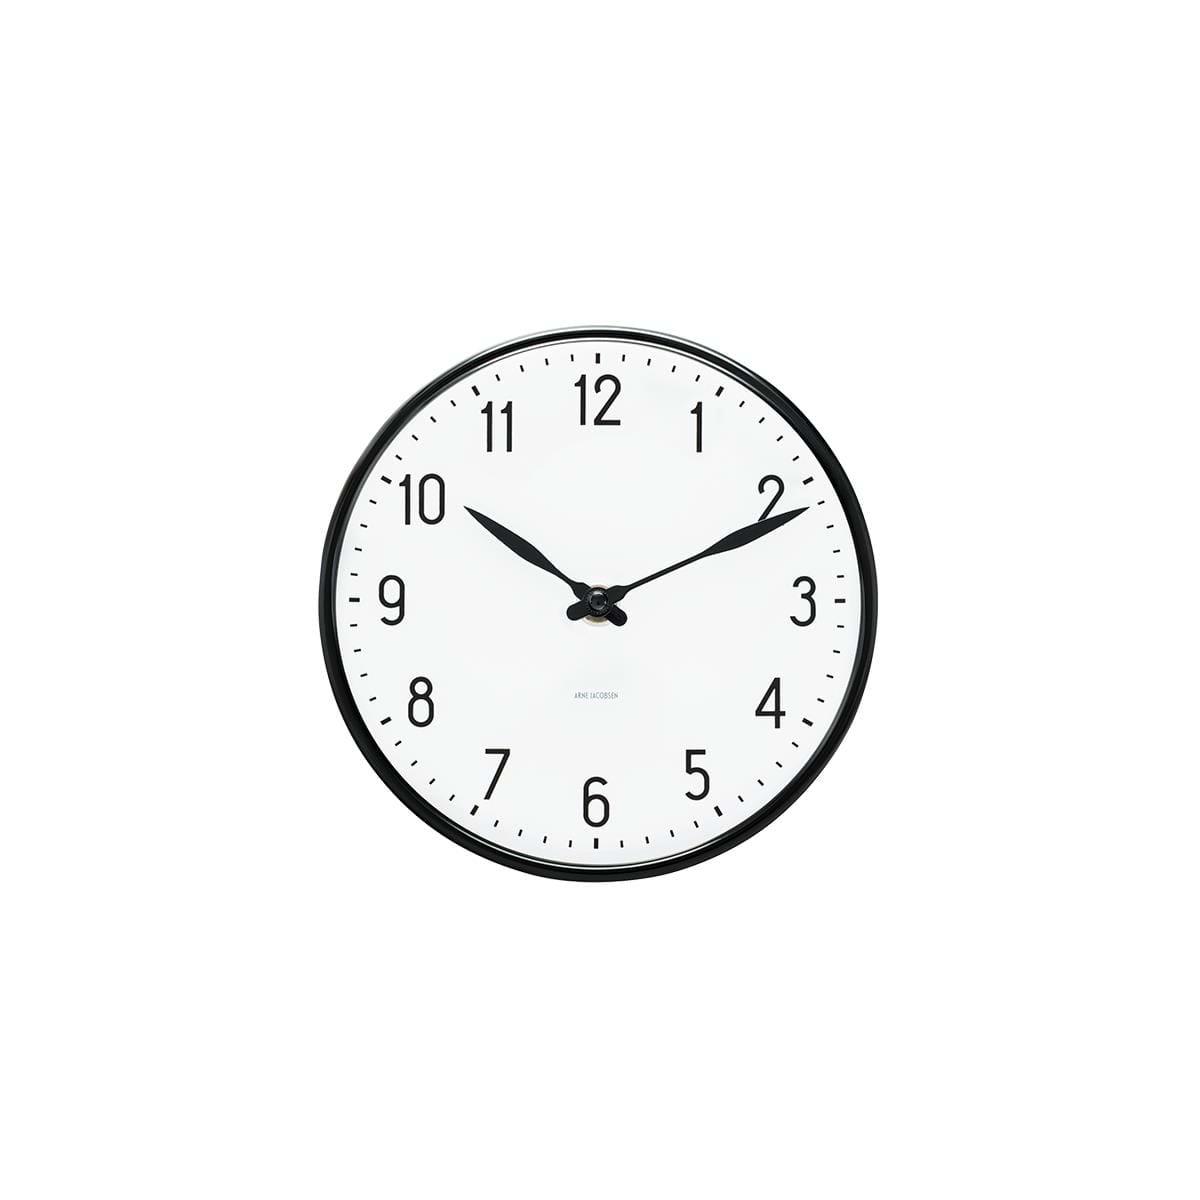 Arne Jacobsen - Station Wall Clock Ø 21 cm - Black (43633)